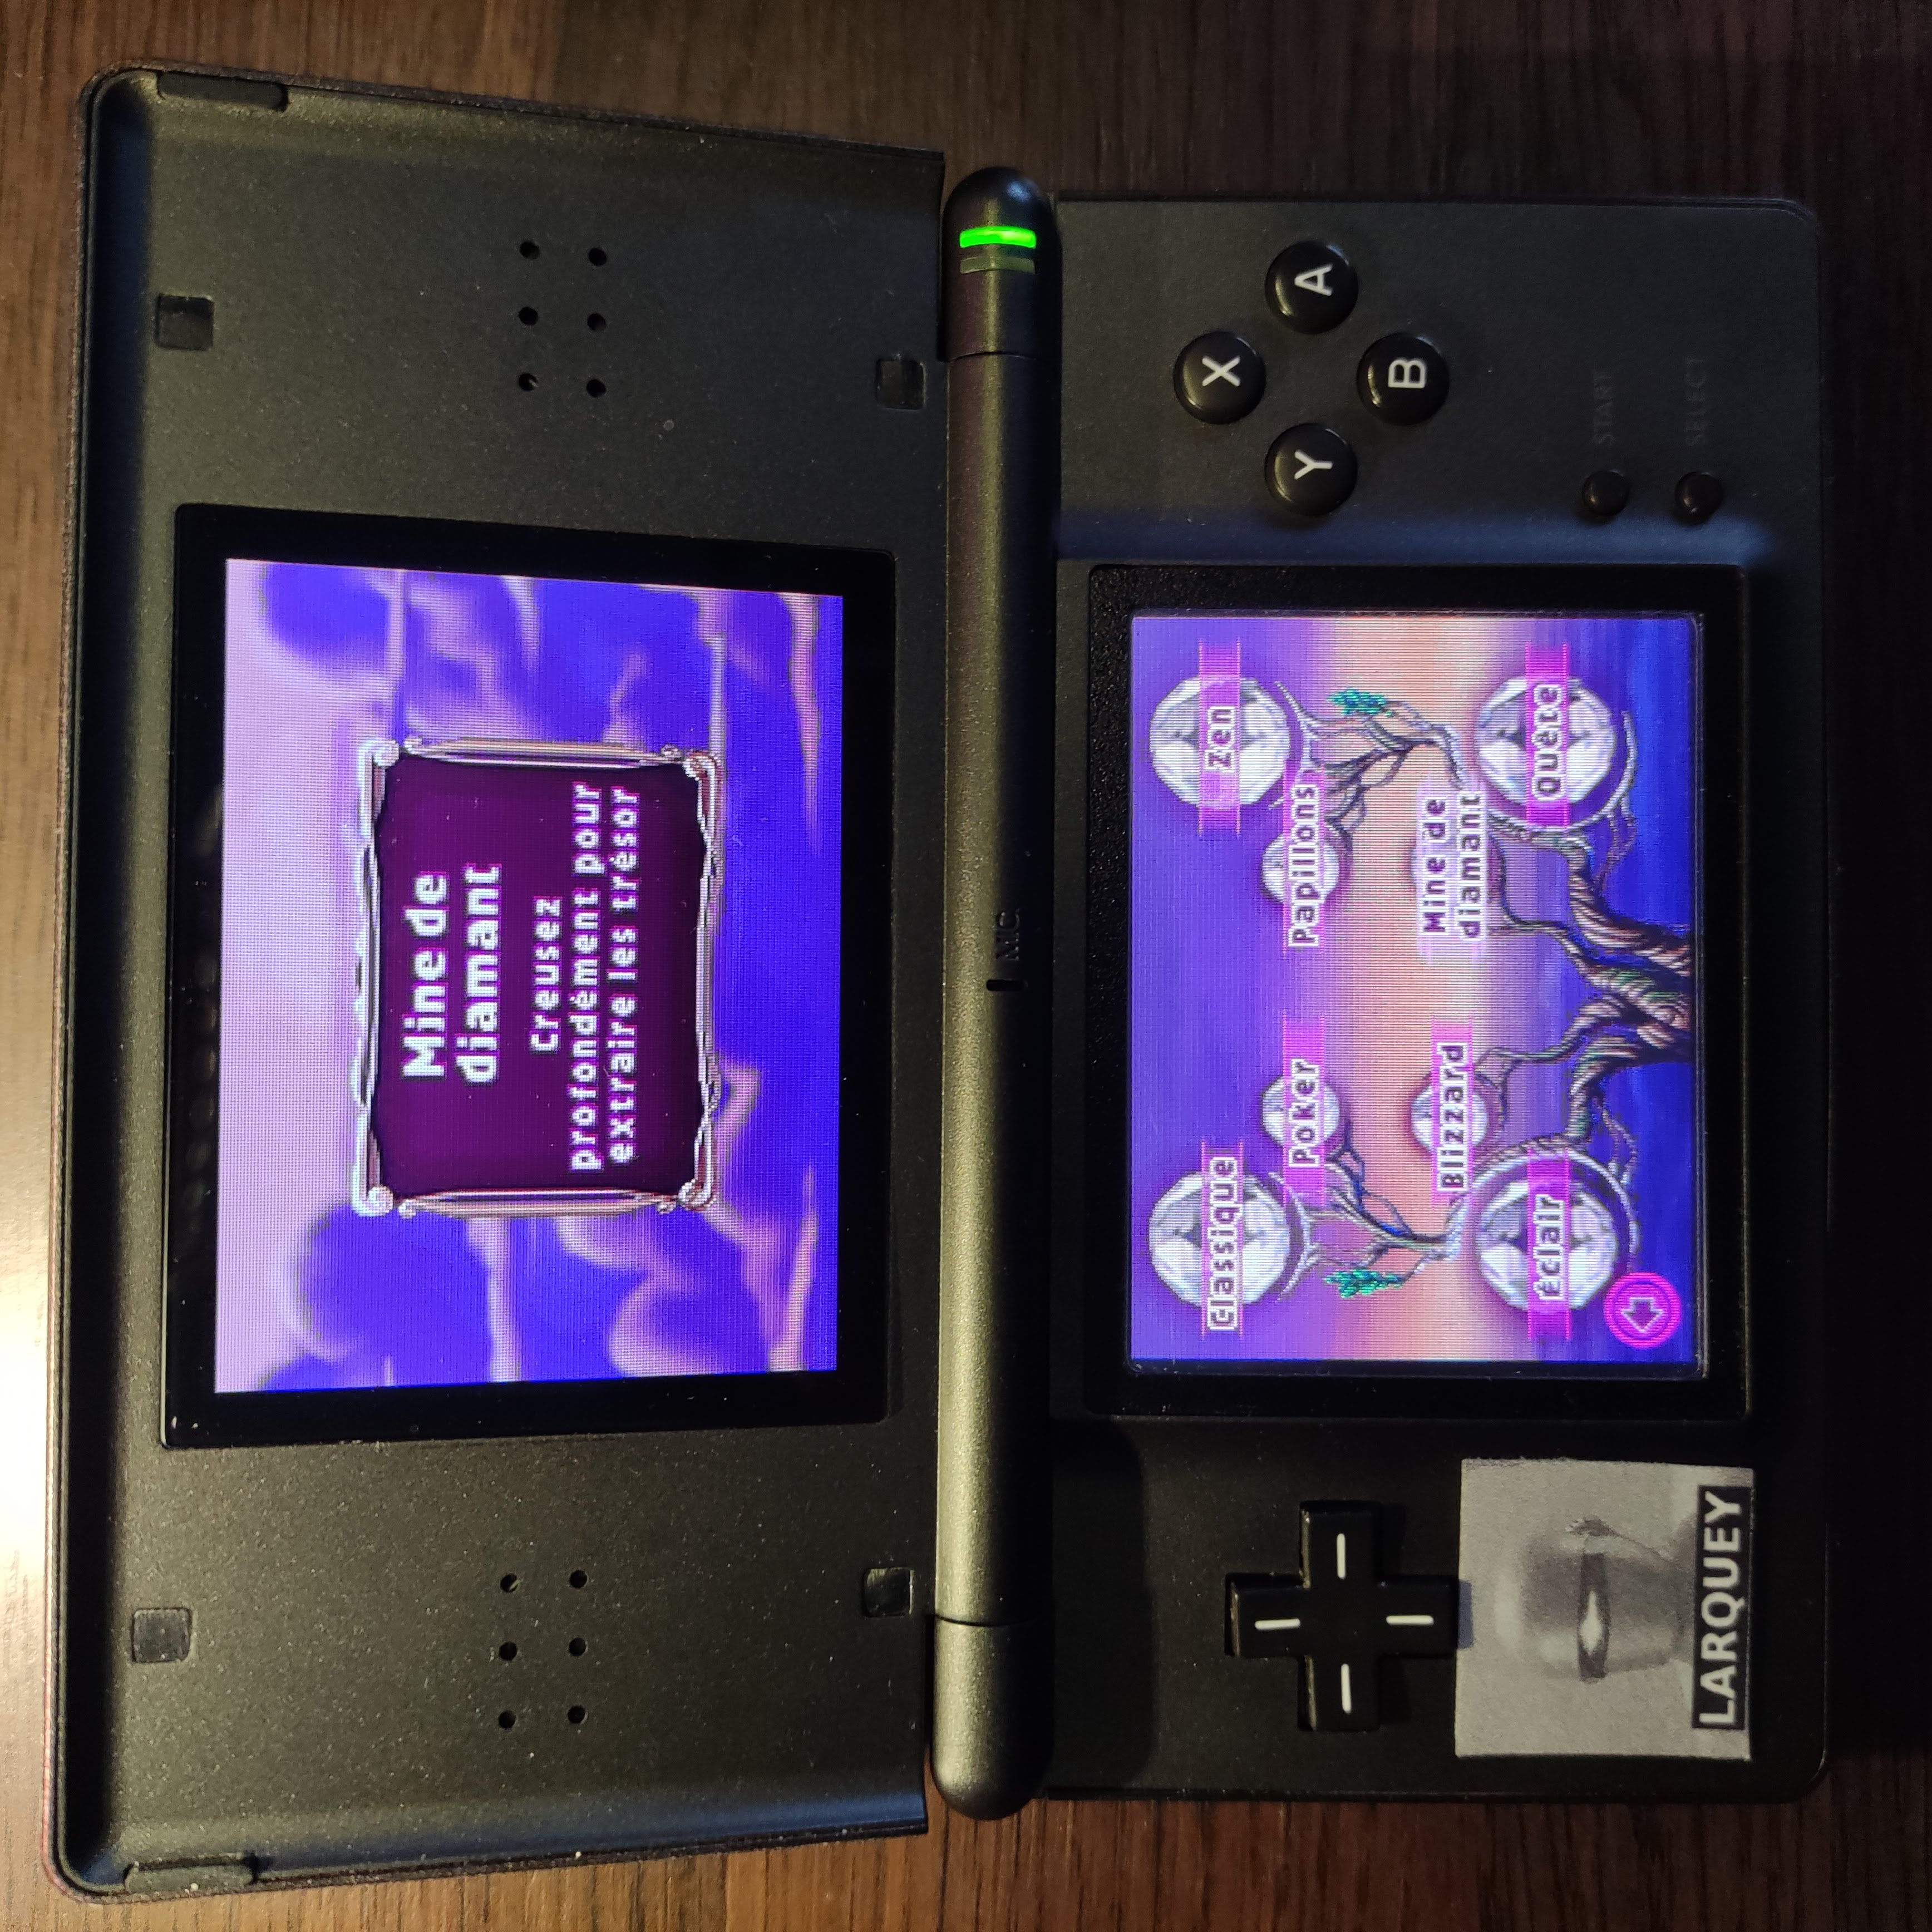 Larquey: Bejeweled 3: Diamond Mine [Best Treasure] (Nintendo DS) 9,000 points on 2020-09-27 12:49:50